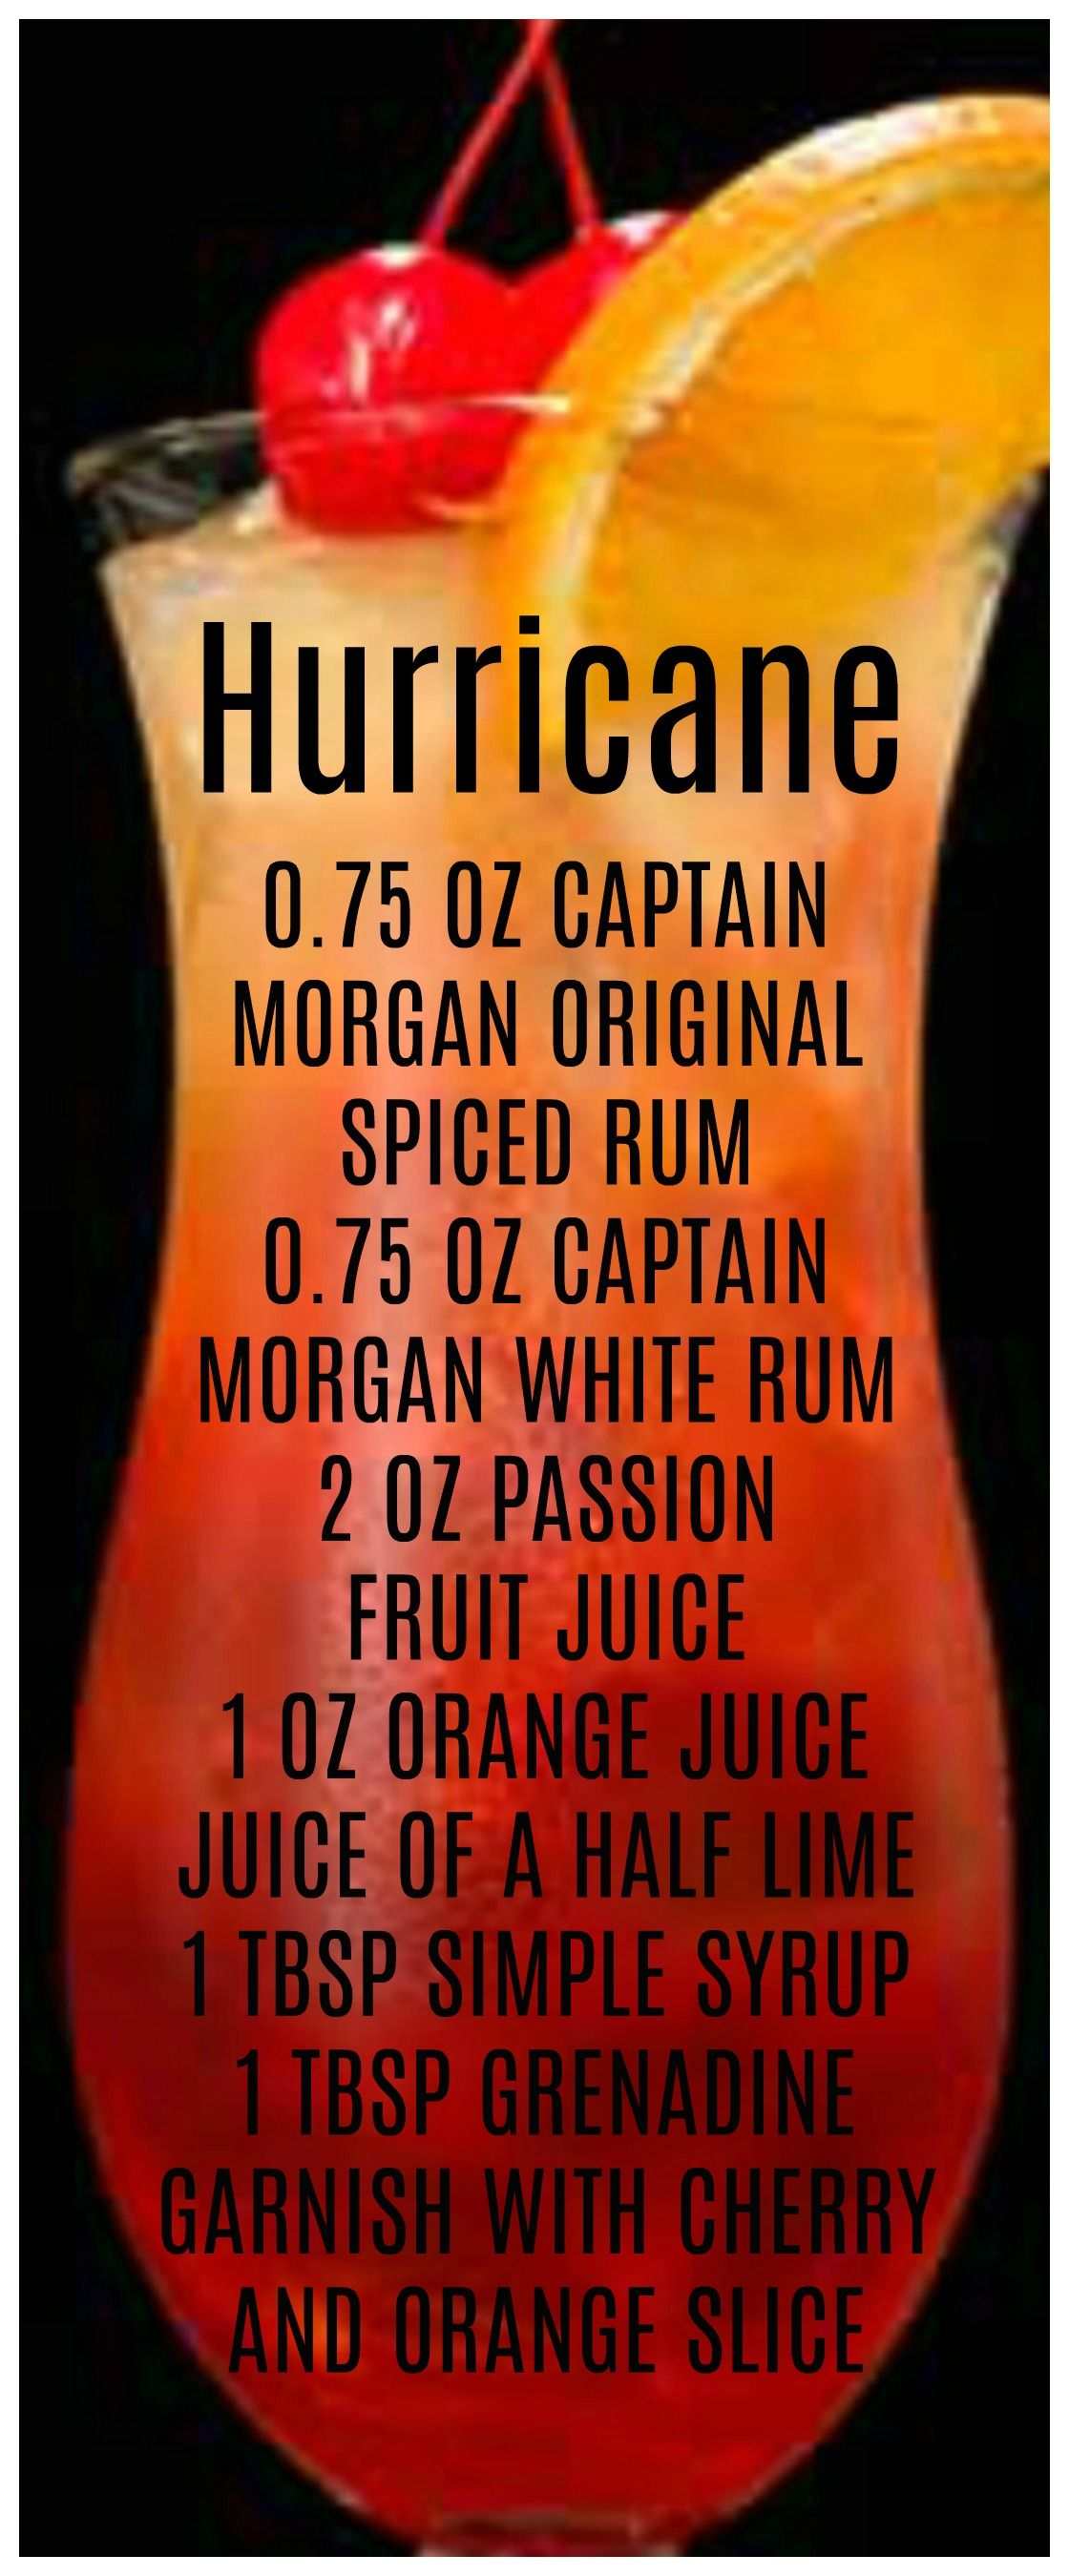 Hurricane Recipe Alcohol Recipes Yummy Alcoholic Drinks Drinks Alcohol Recipes